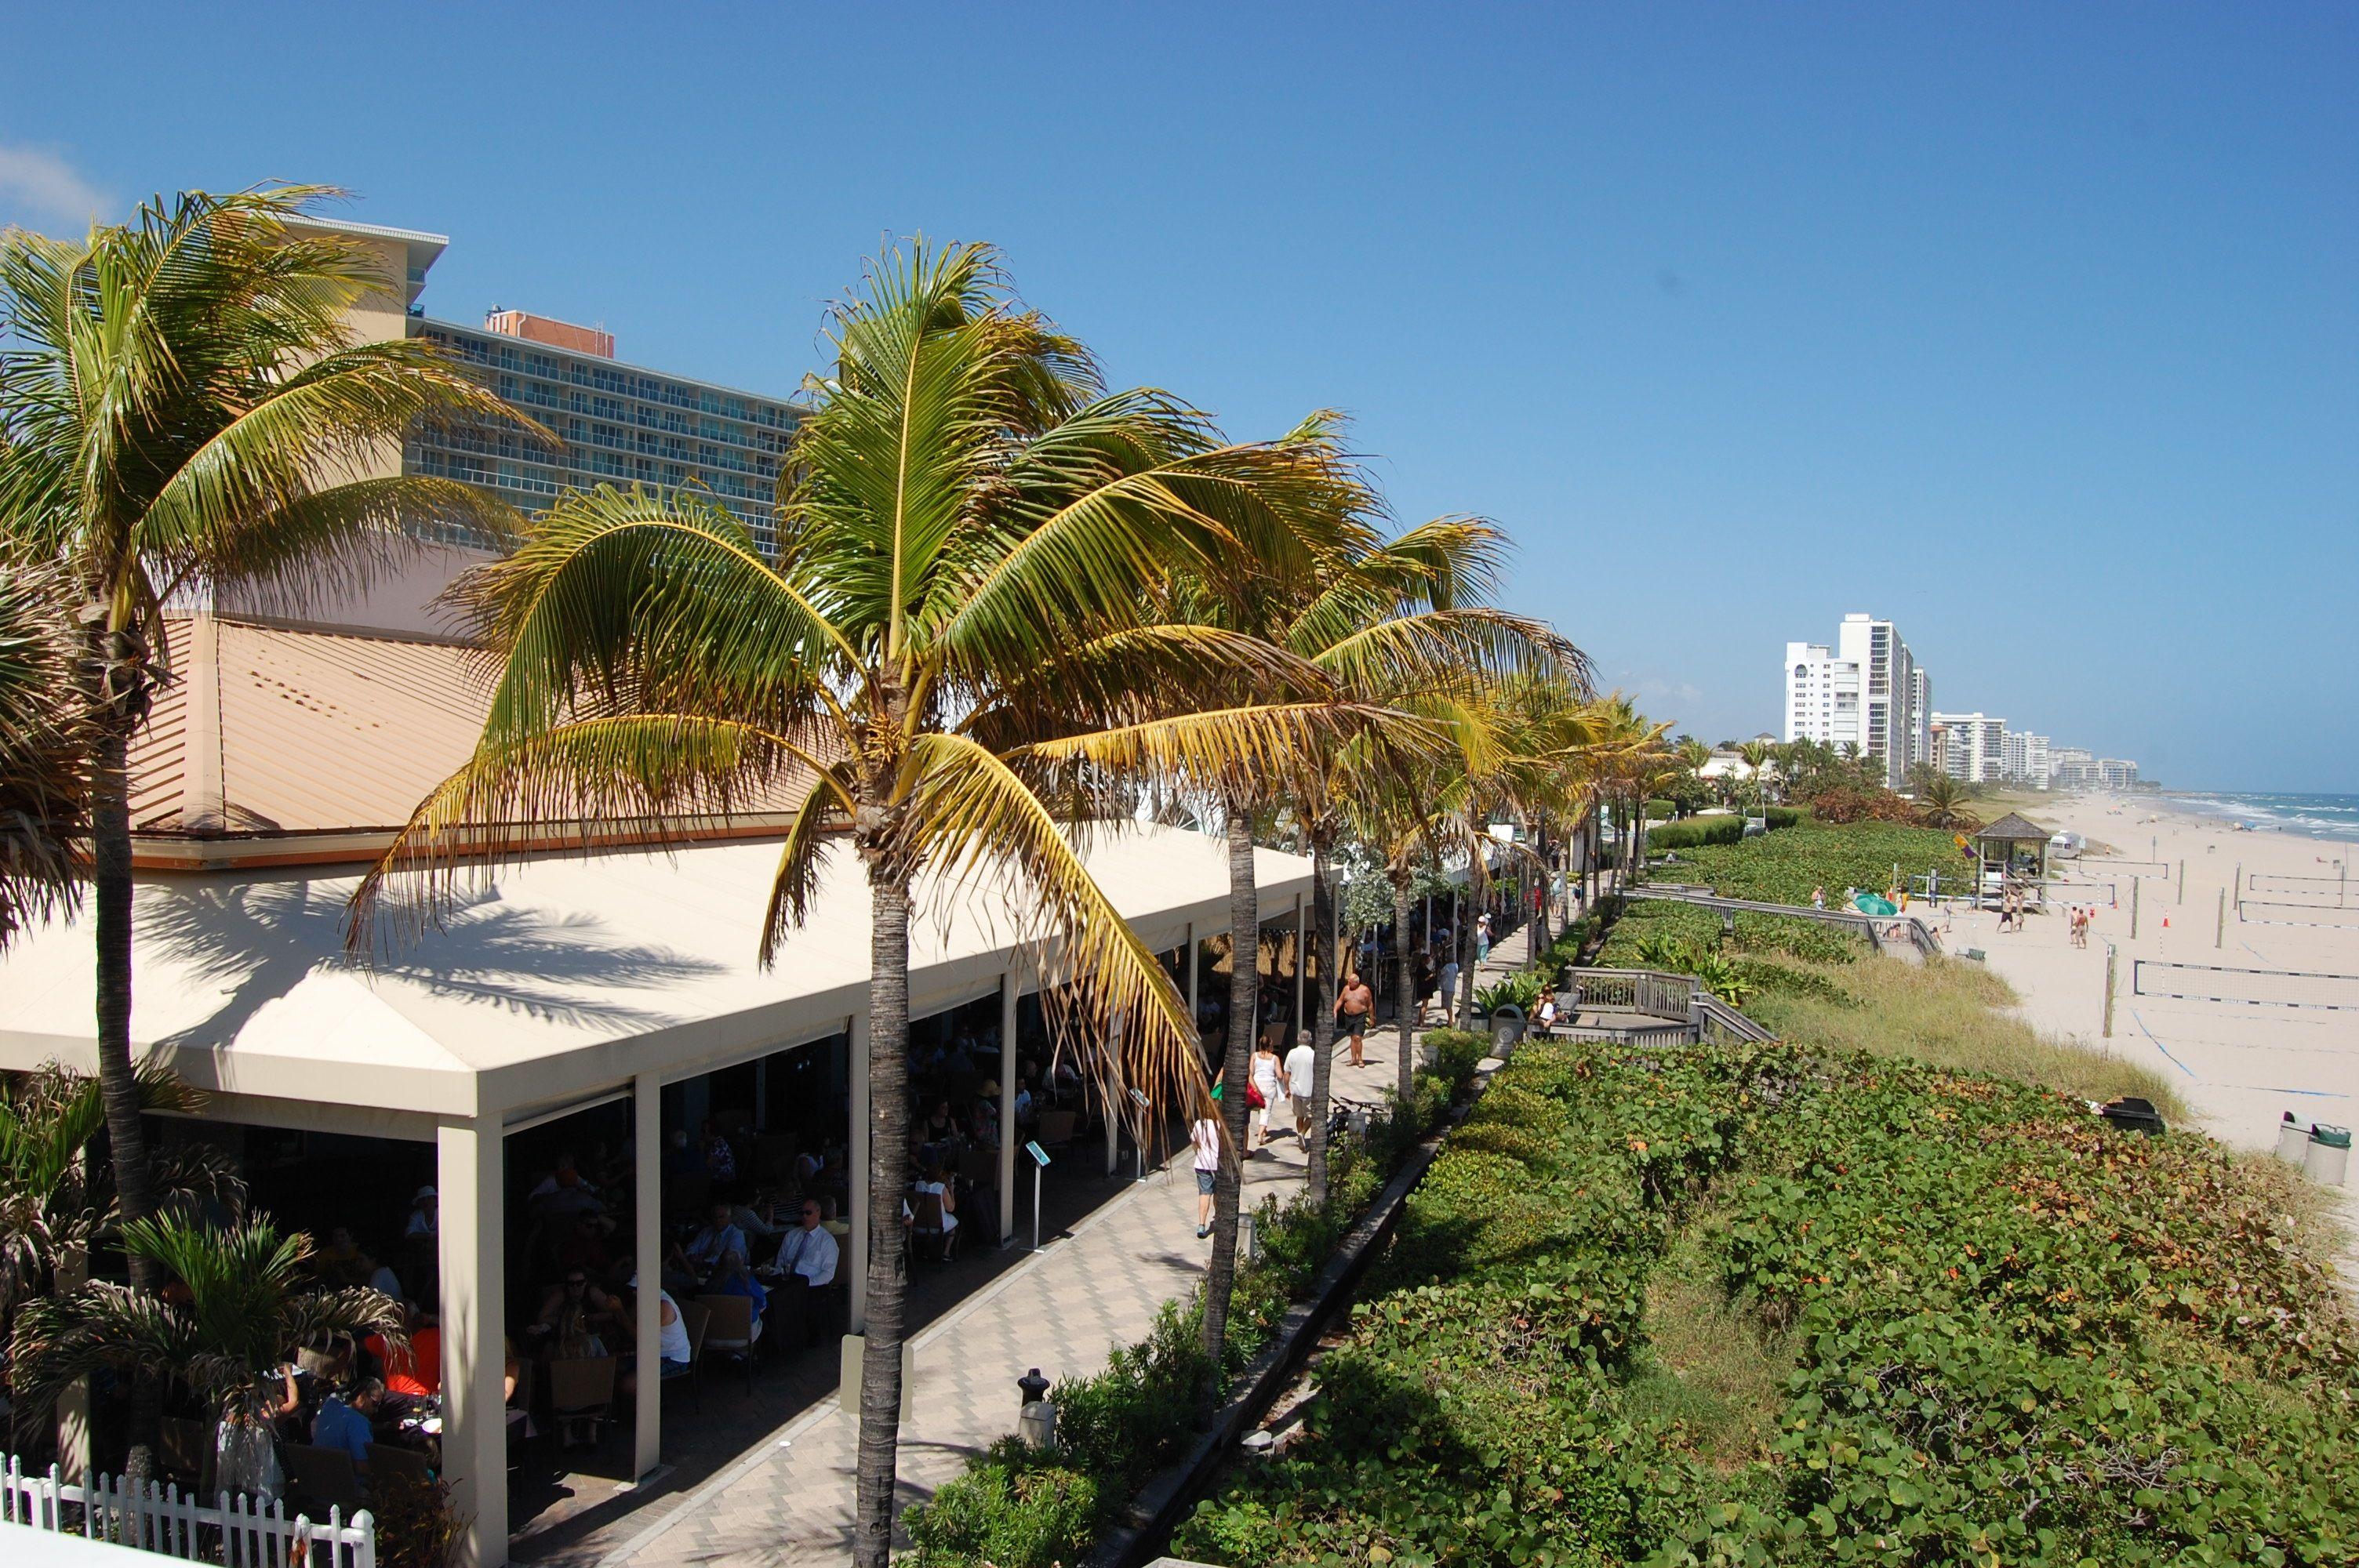 Restaurants Bars Beach Pier All In